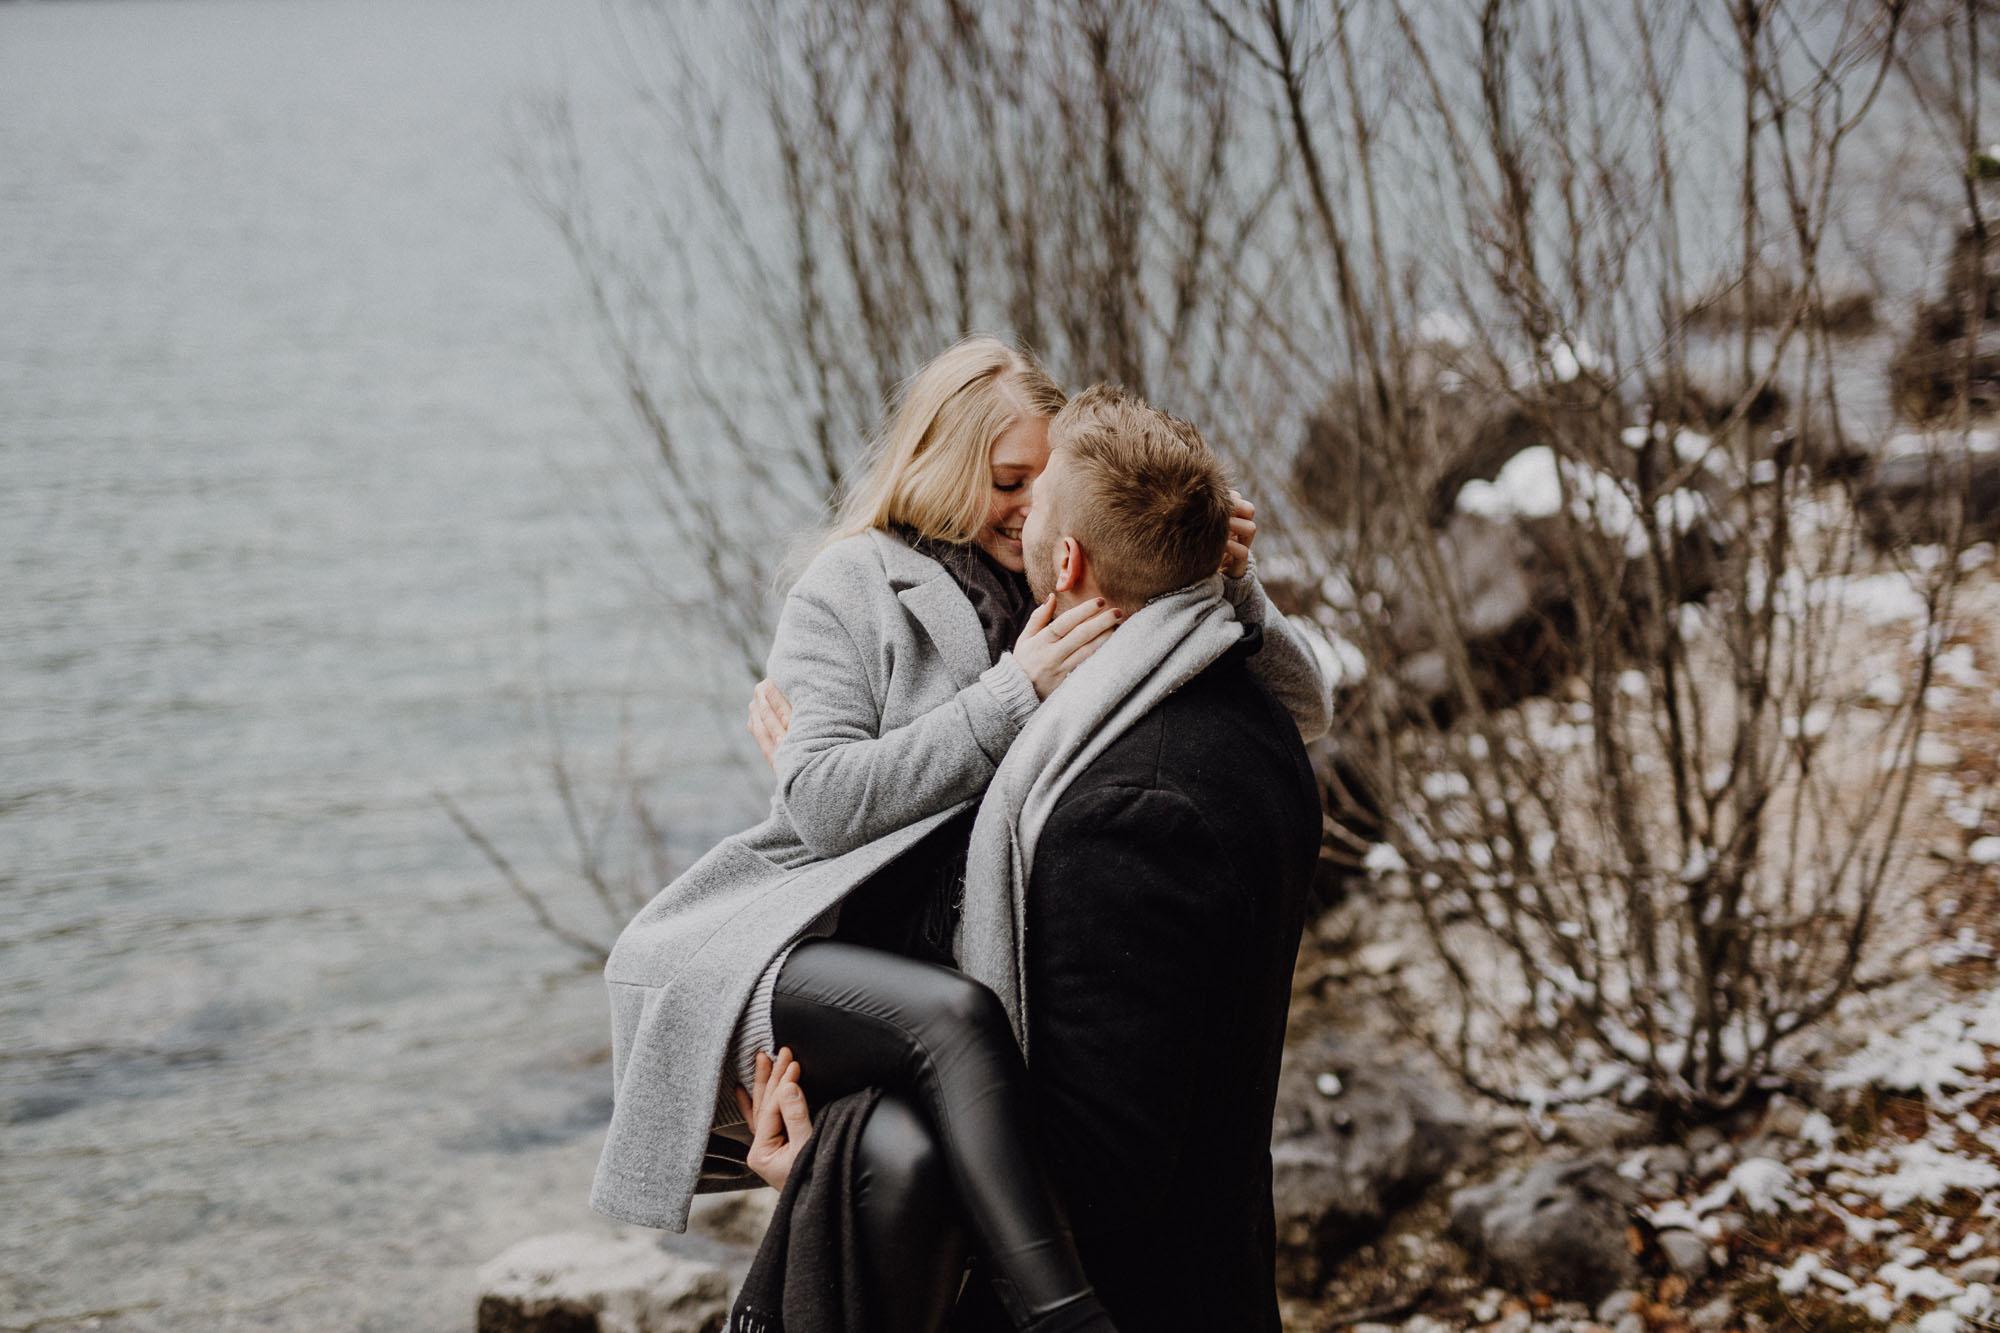 raissa simon photography destination couple munich eibsee 043 - Laura + Dominik